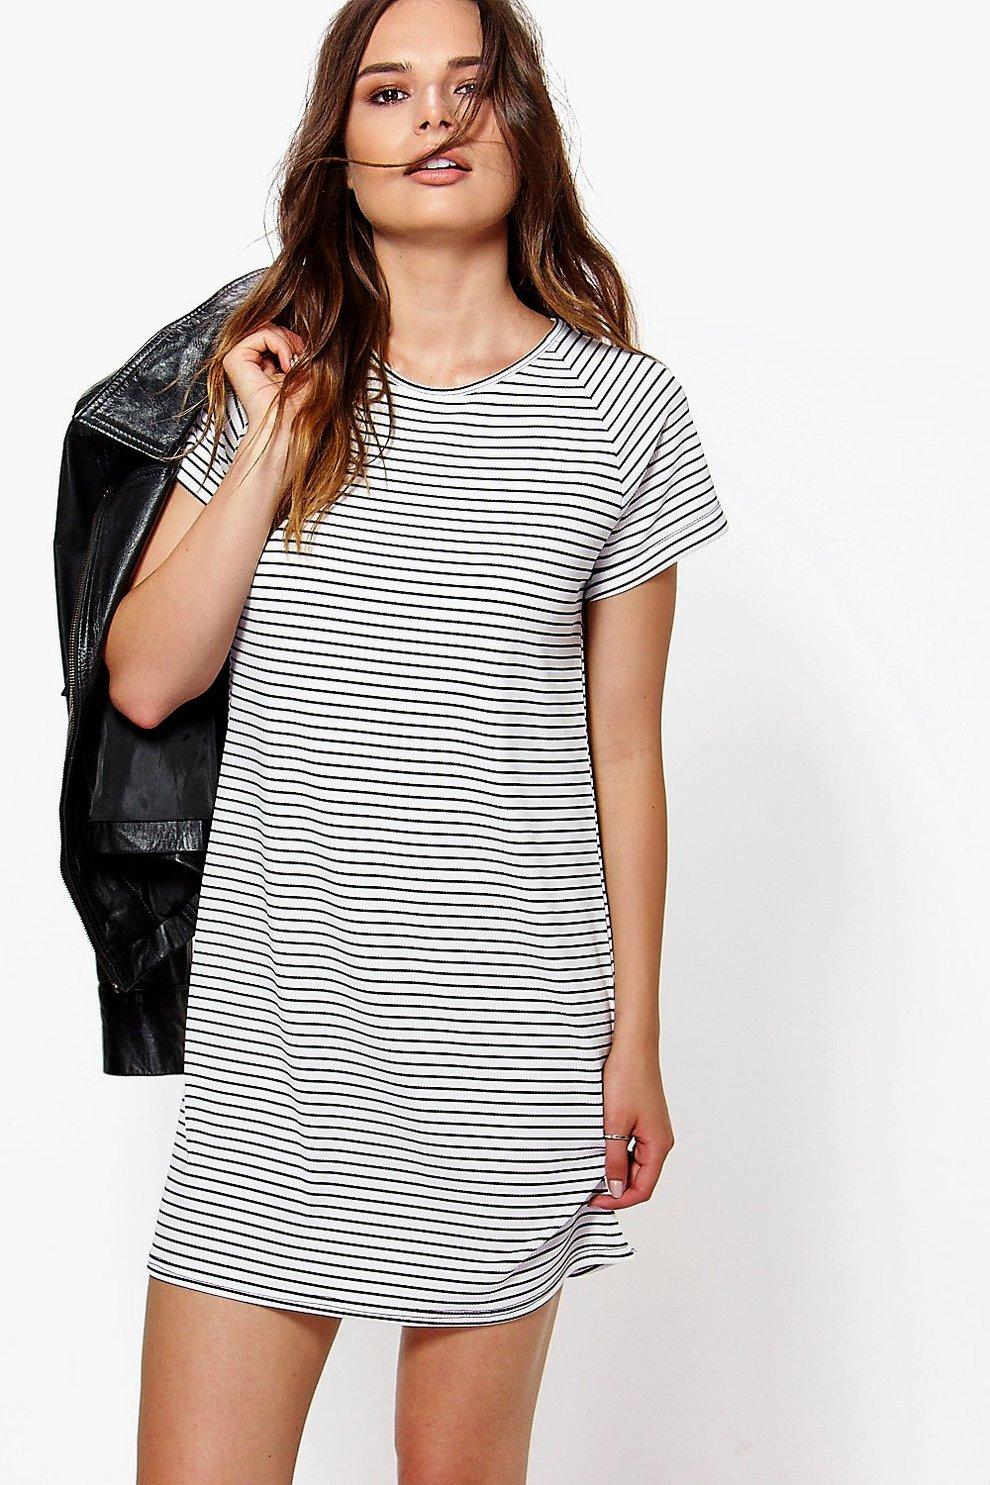 d51b8c853244 Candy T-Shirt Dress In Stripe Print | Boohoo